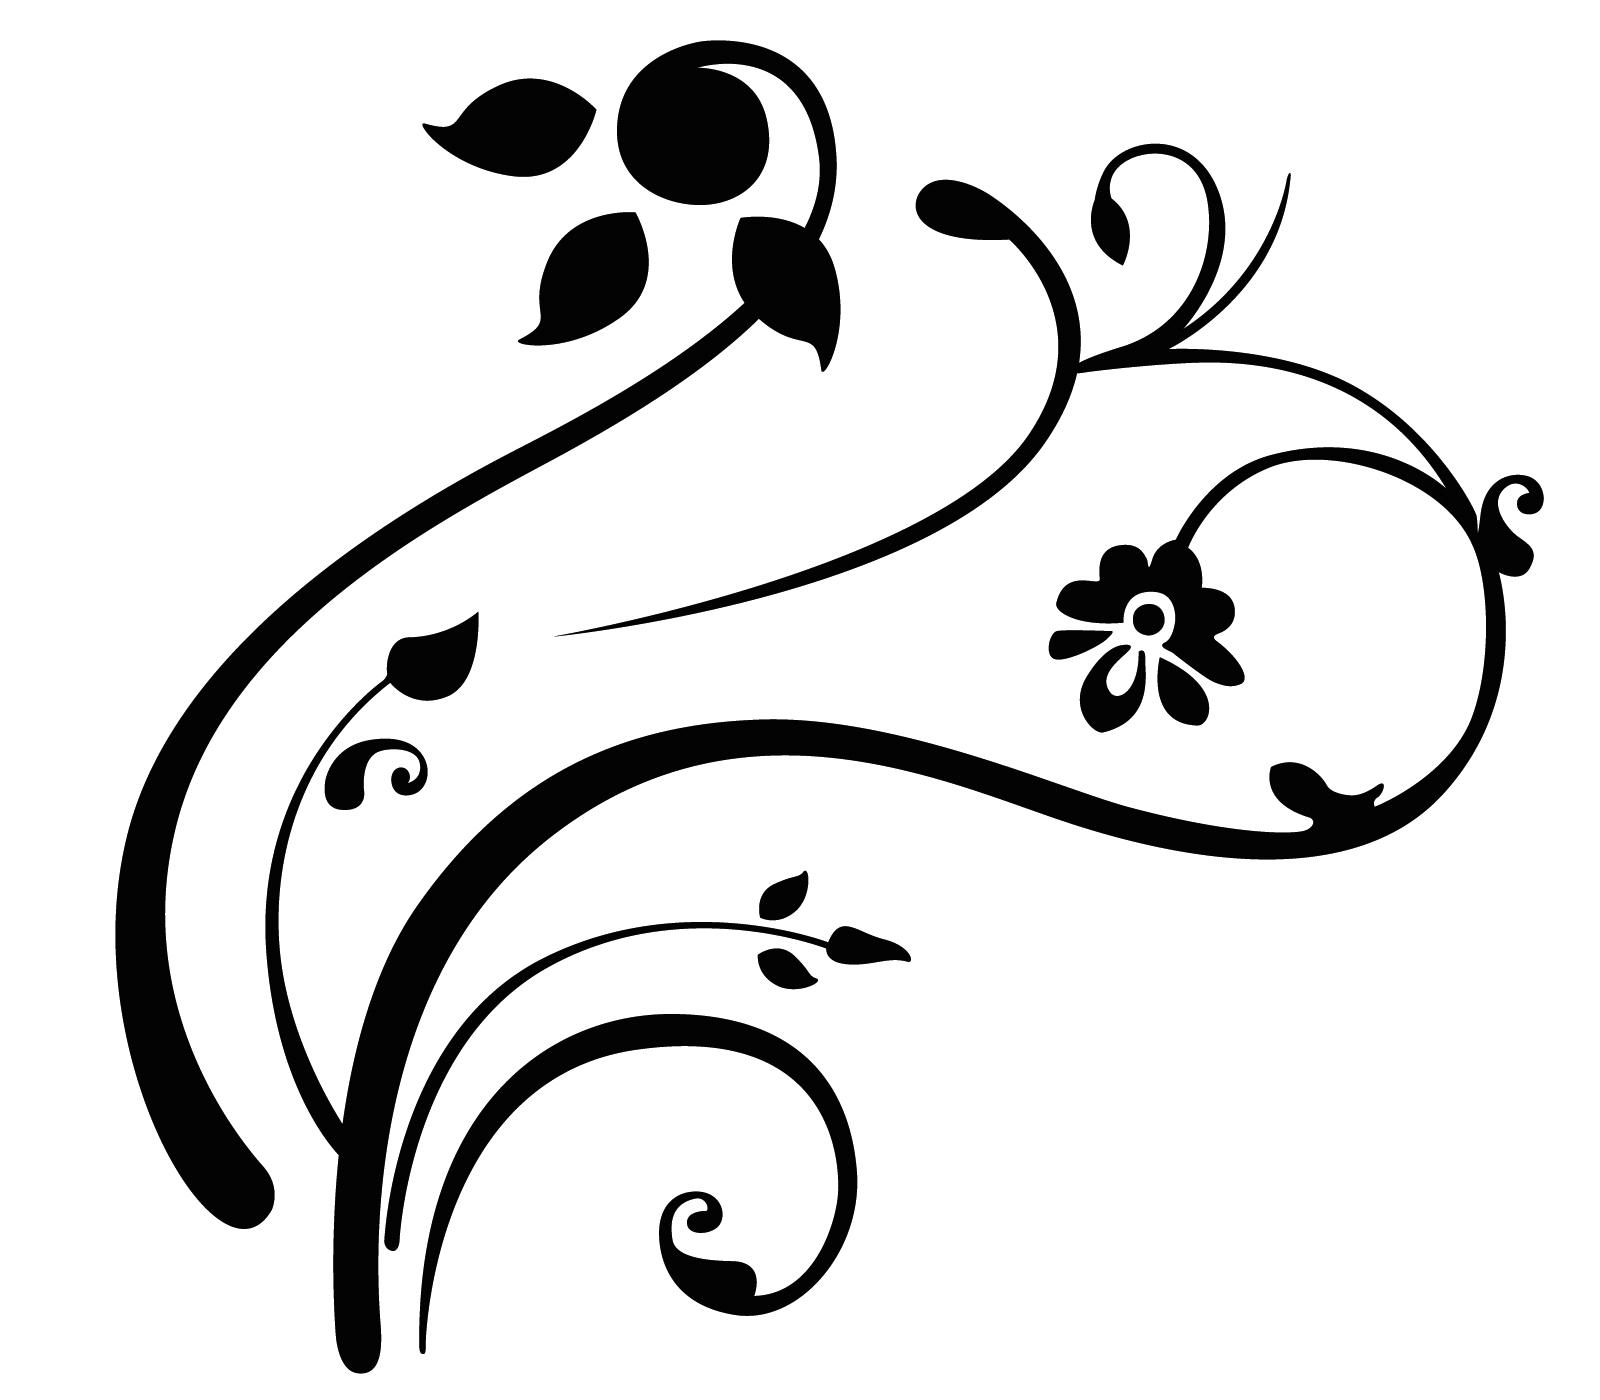 hight resolution of design clip art free clipart